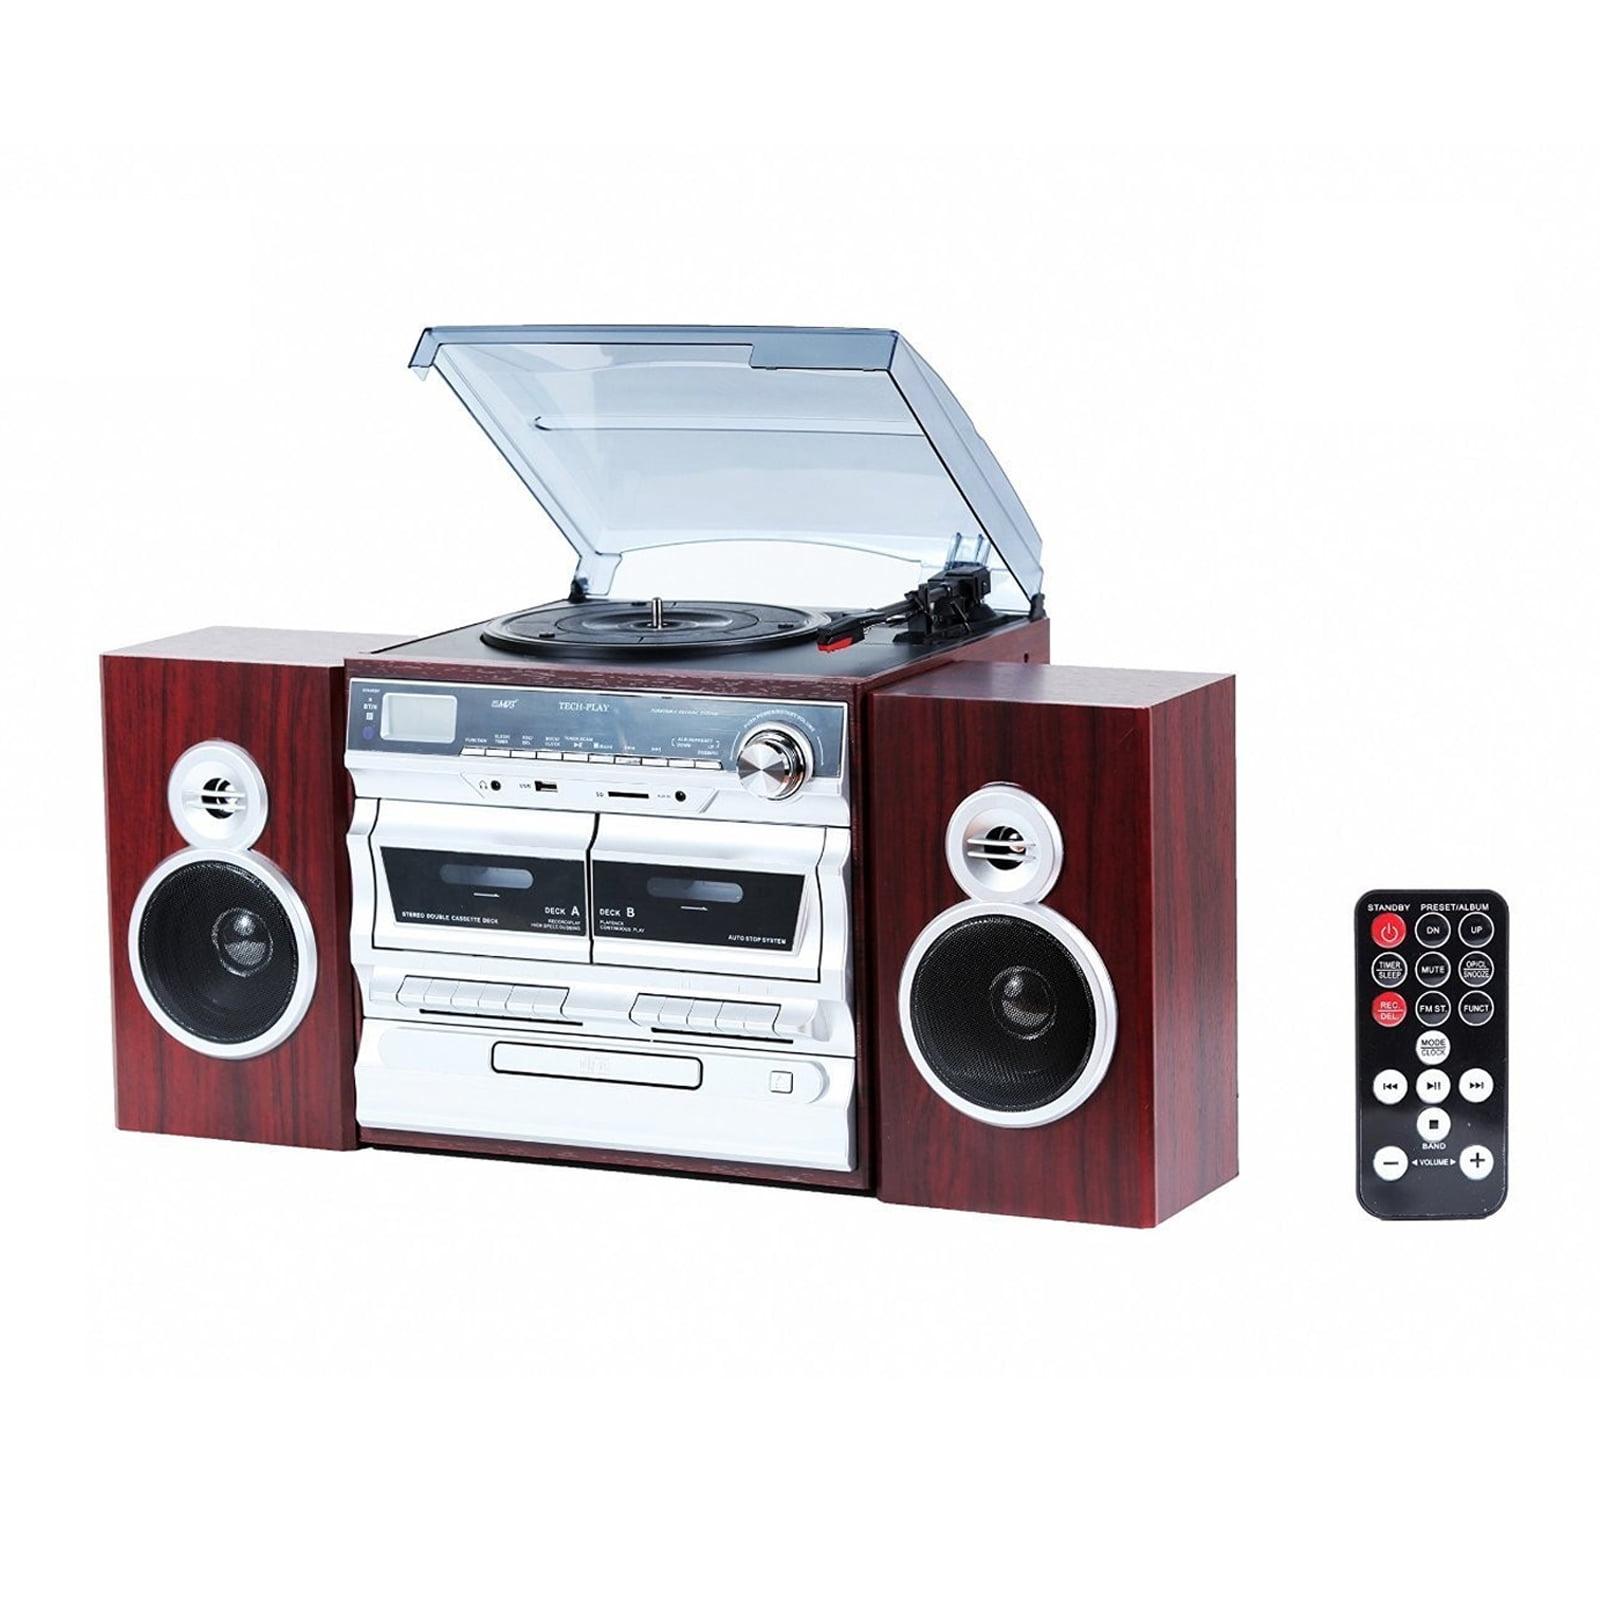 TechPlach High Power 30W, 3-Speed Turntable with Karaoke